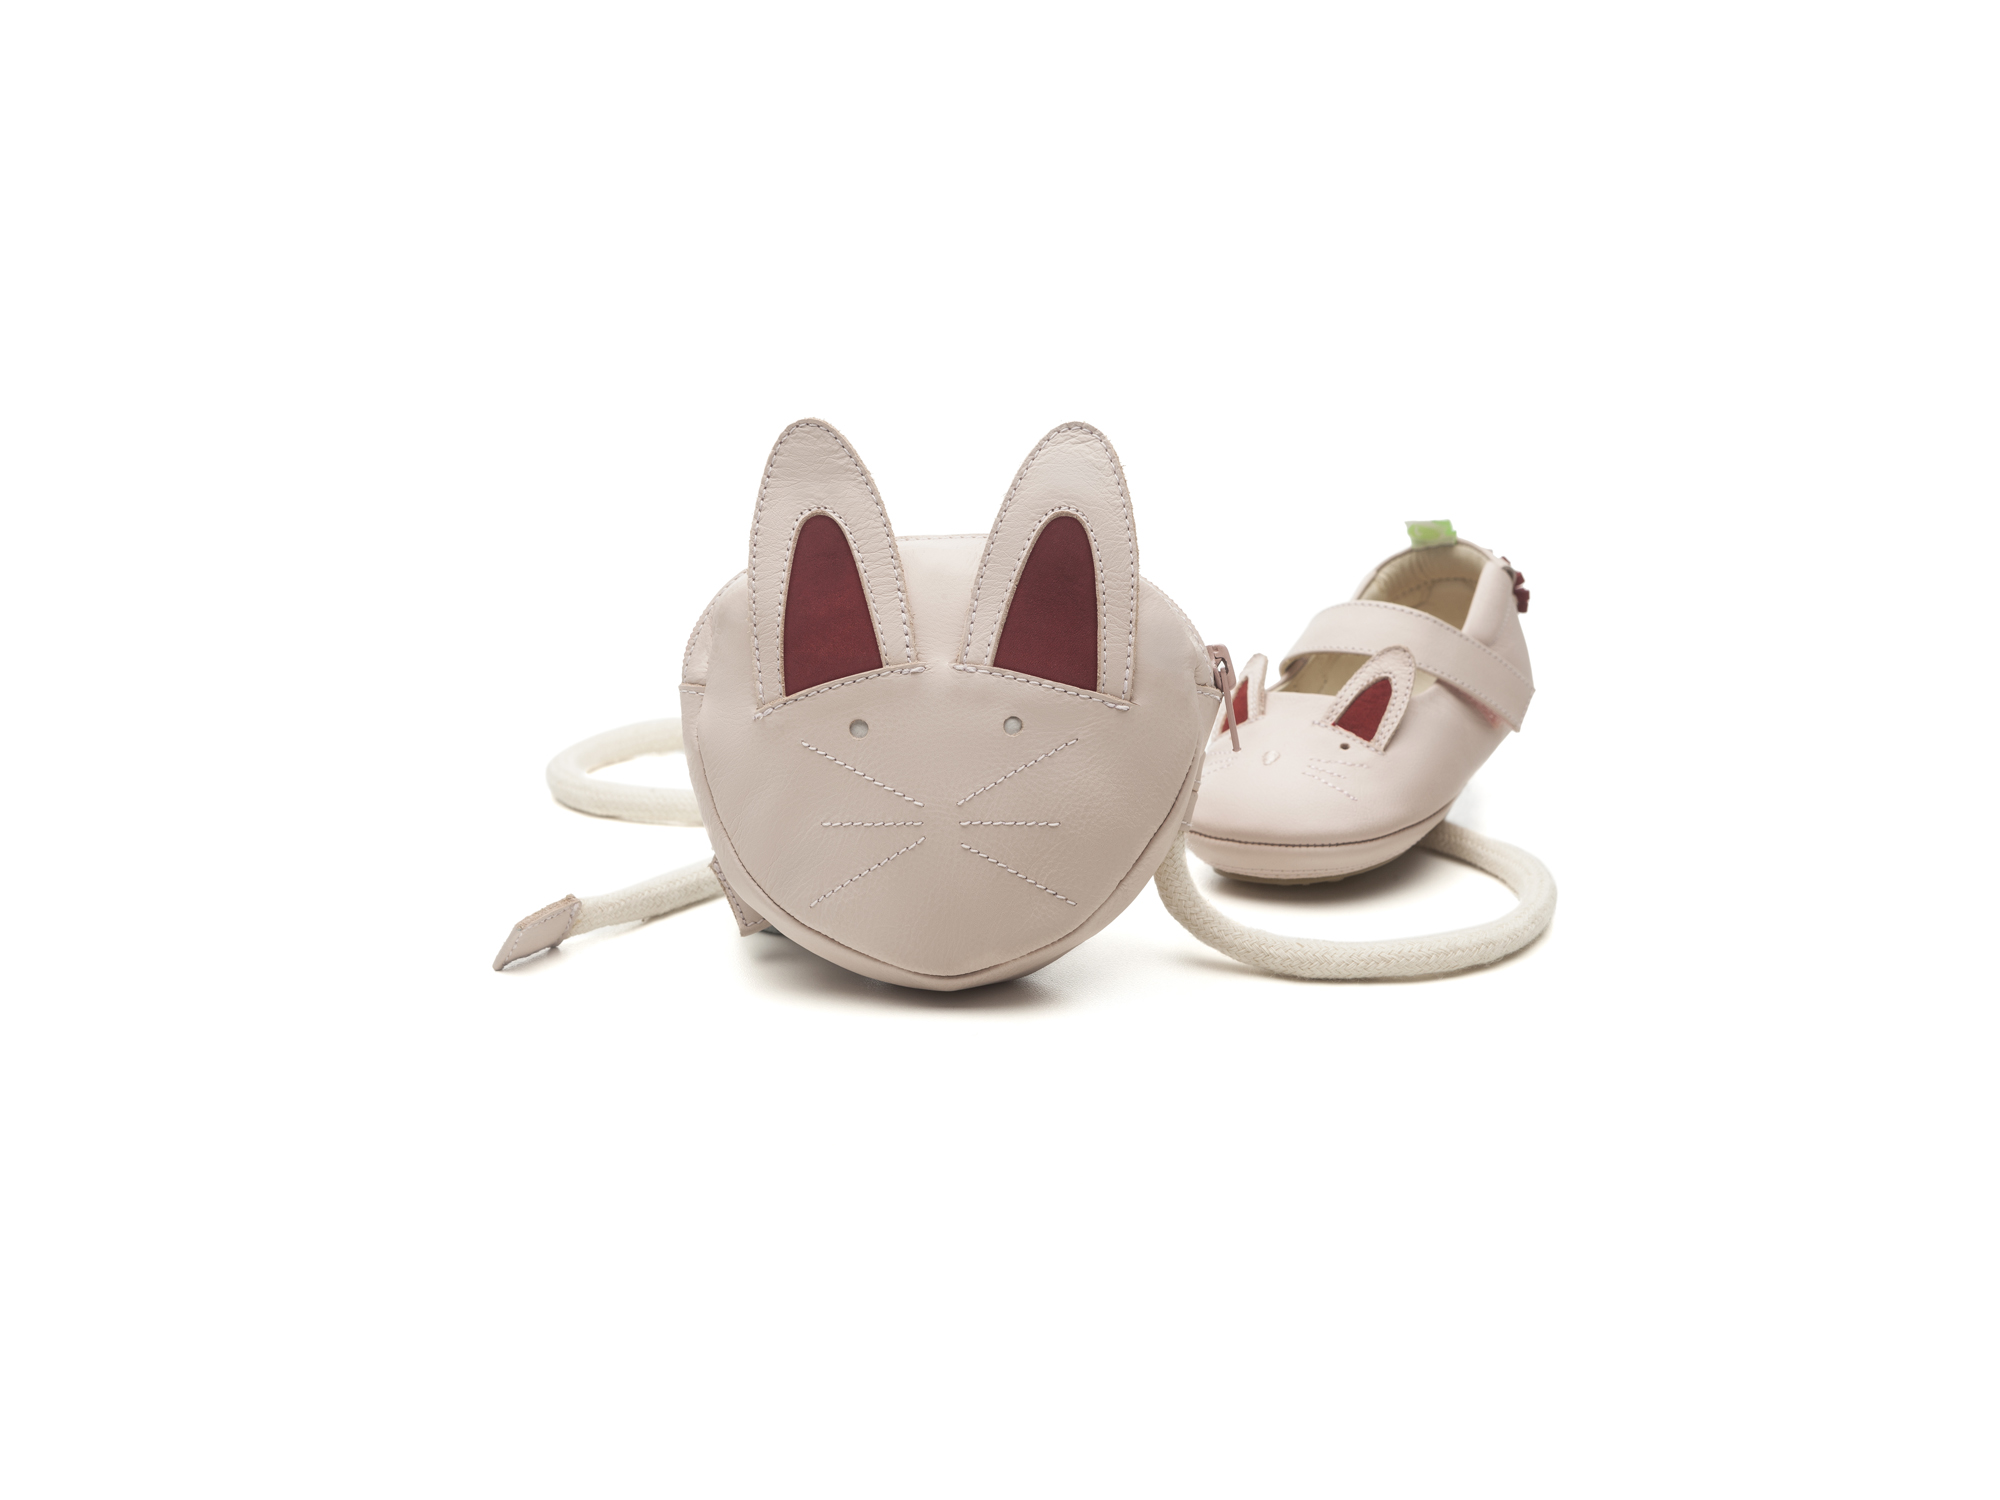 Bolsa Bag Bunny Cotton Candy Toddler 2 à 4 anos - 3